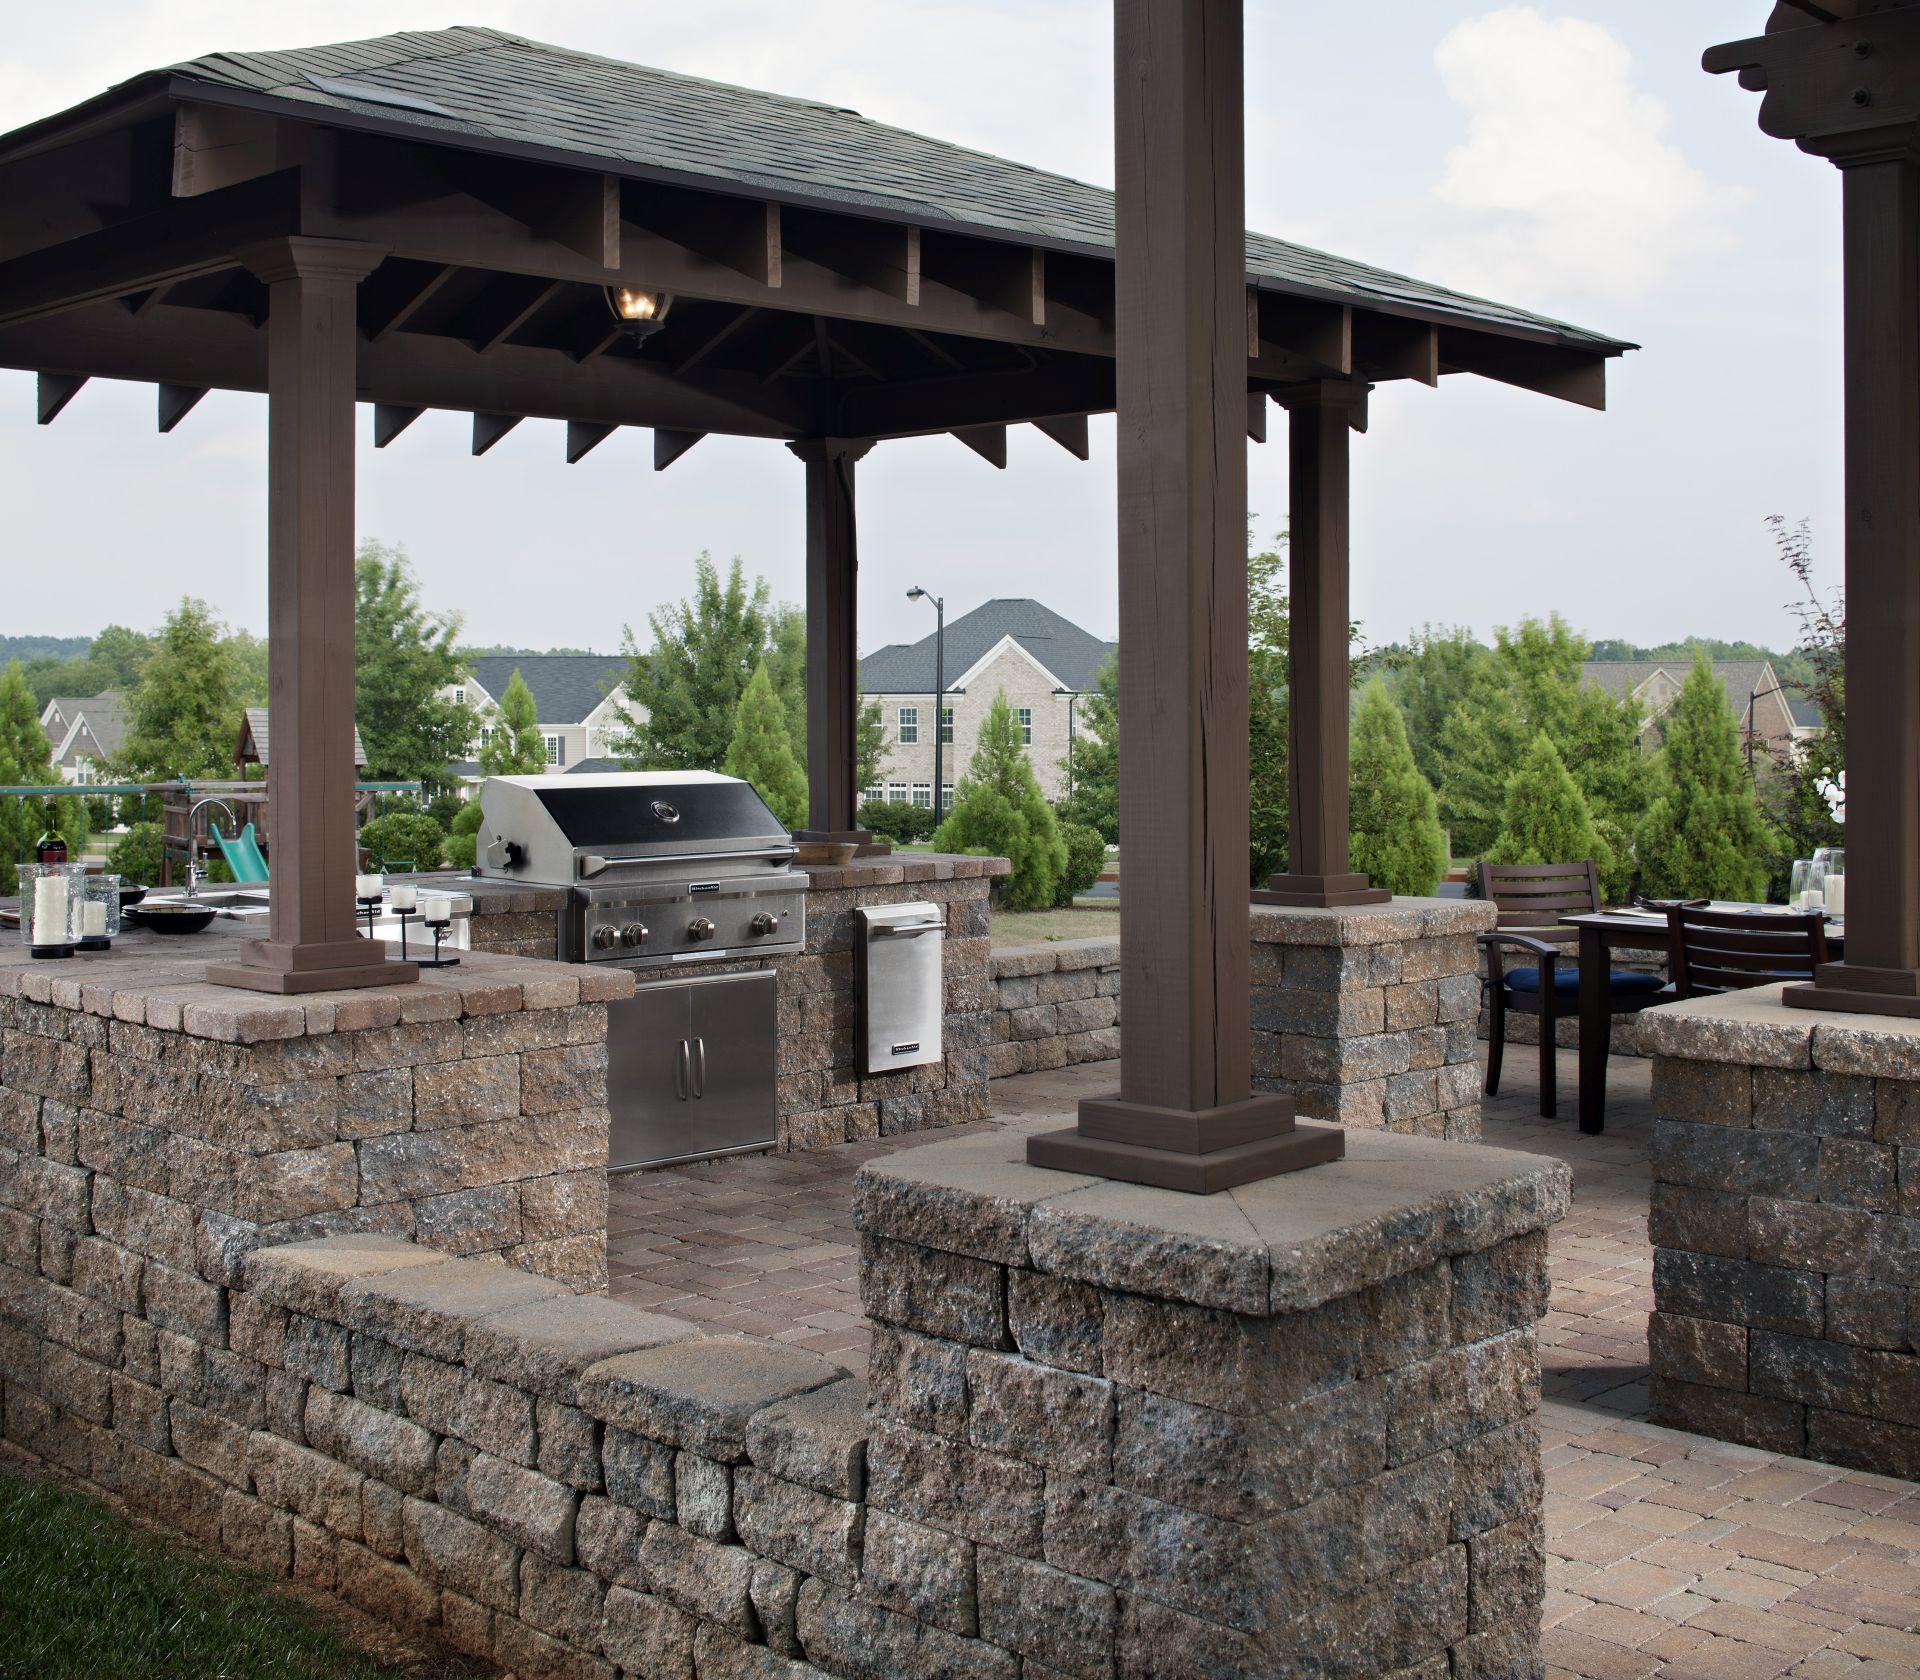 outdoor kitchen countertops ideas outdoor kitchen countertops Paving Stone Outdoor Kitchen Countertops